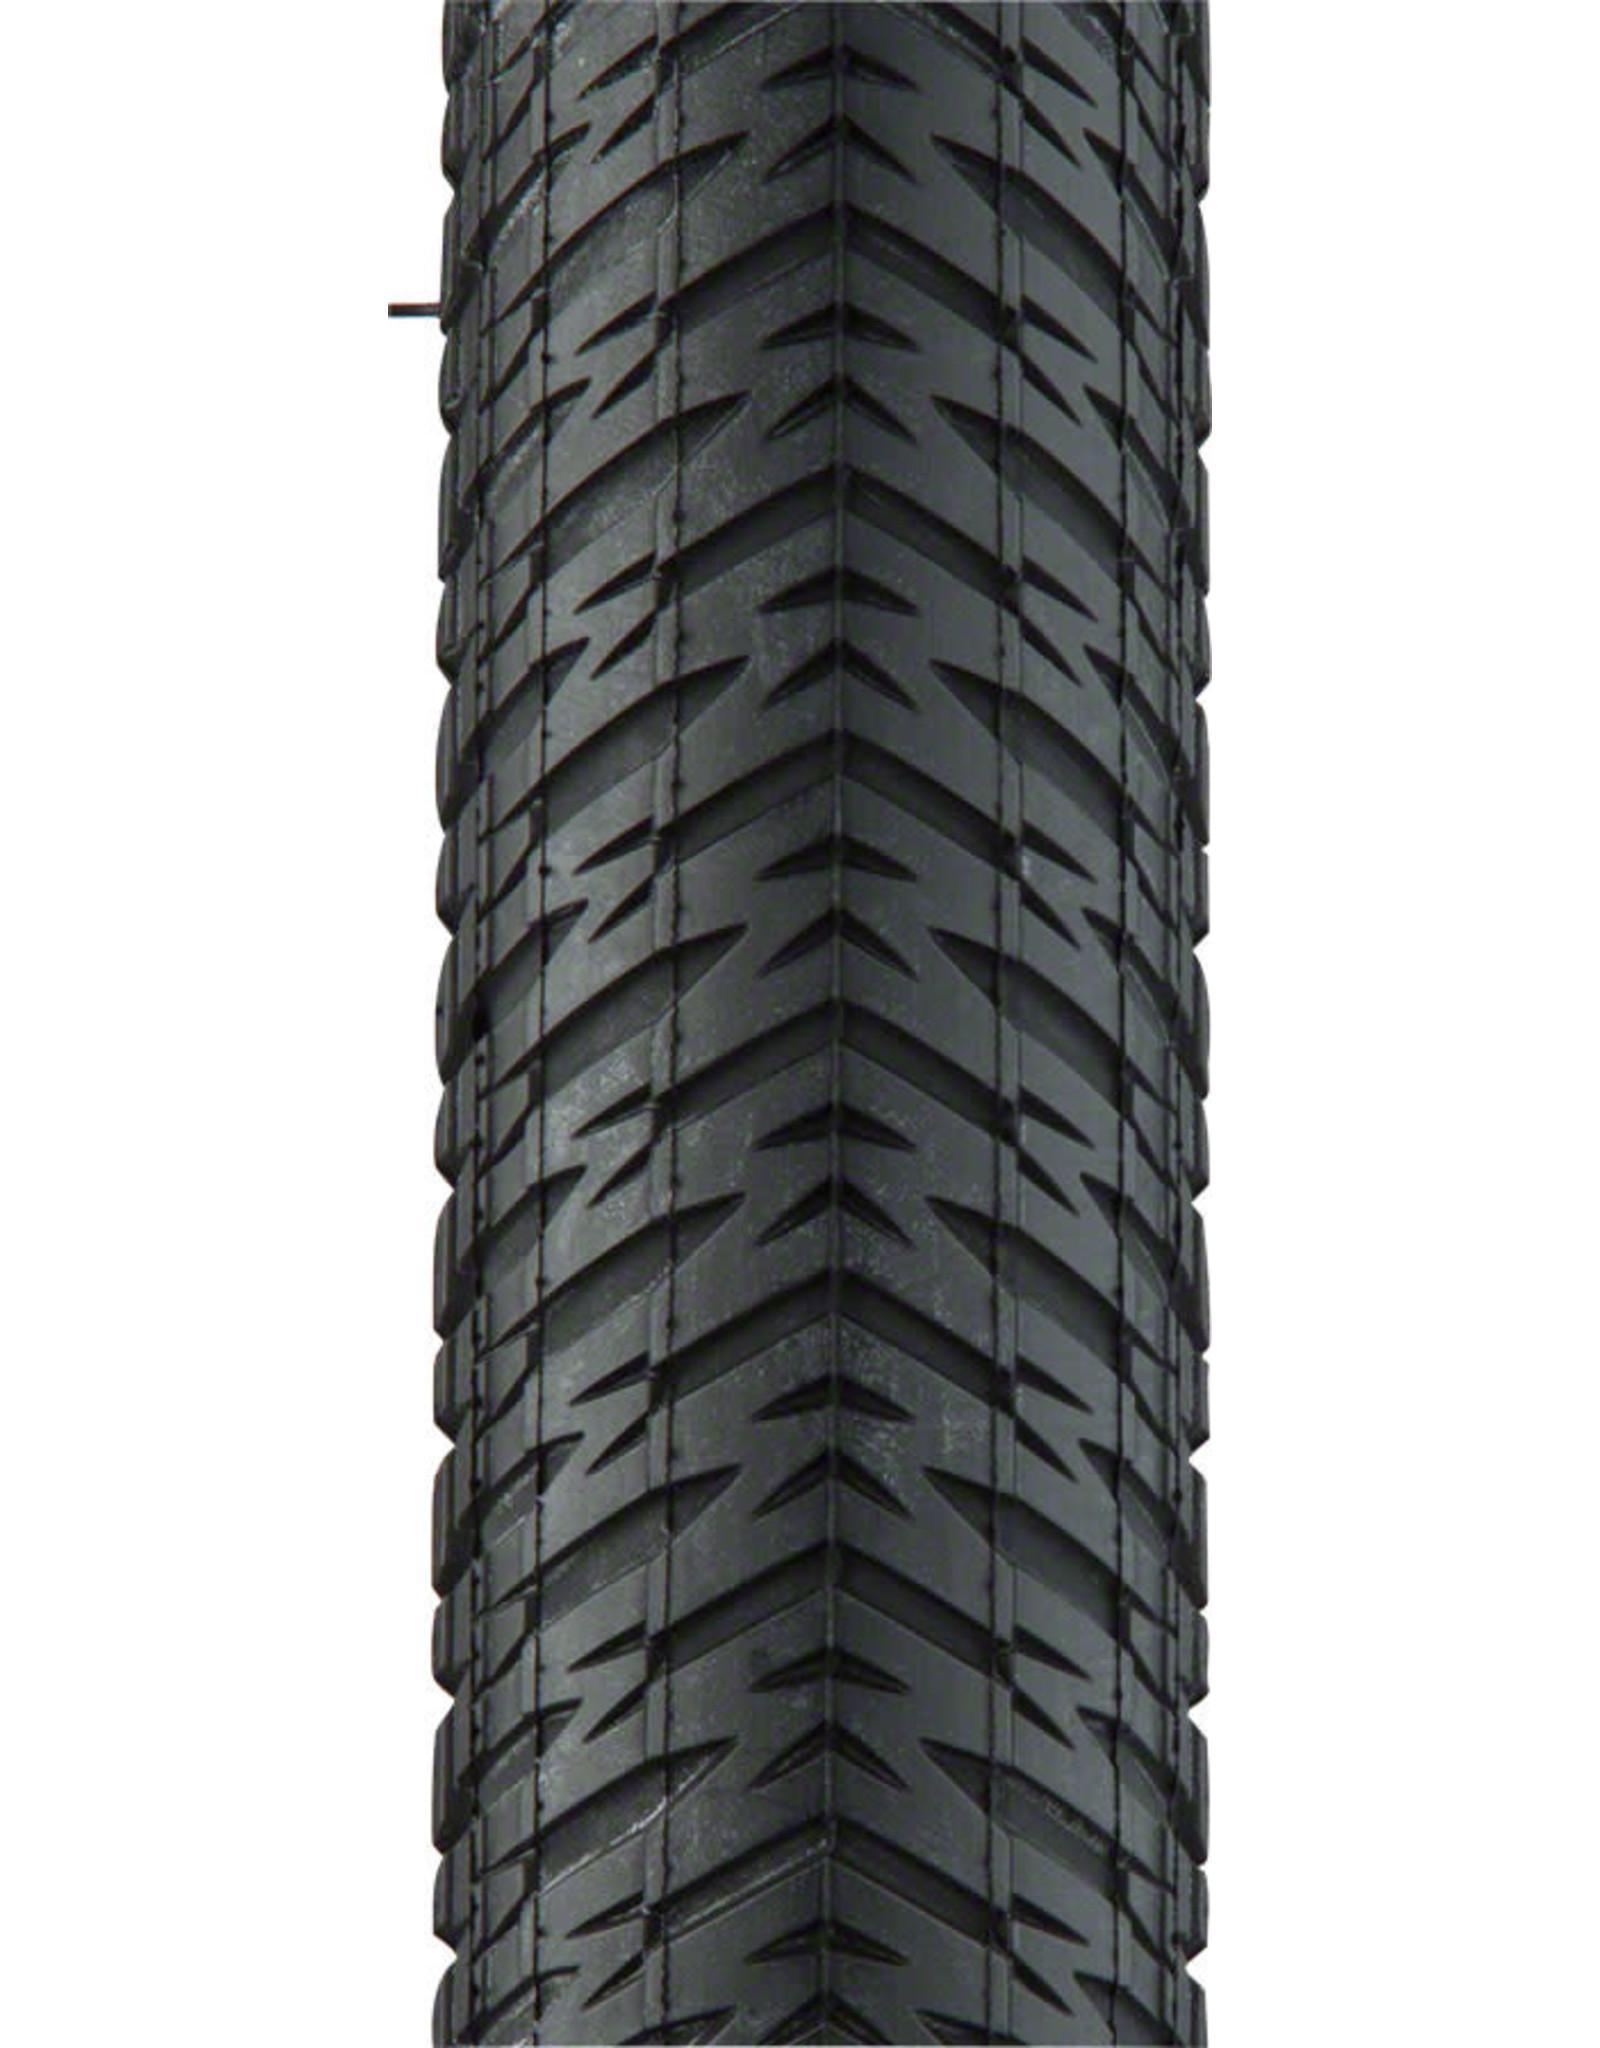 Maxxis Maxxis DTH Tire - 24 x 1.75, Clincher, Wire, Black, Dual, Silkworm